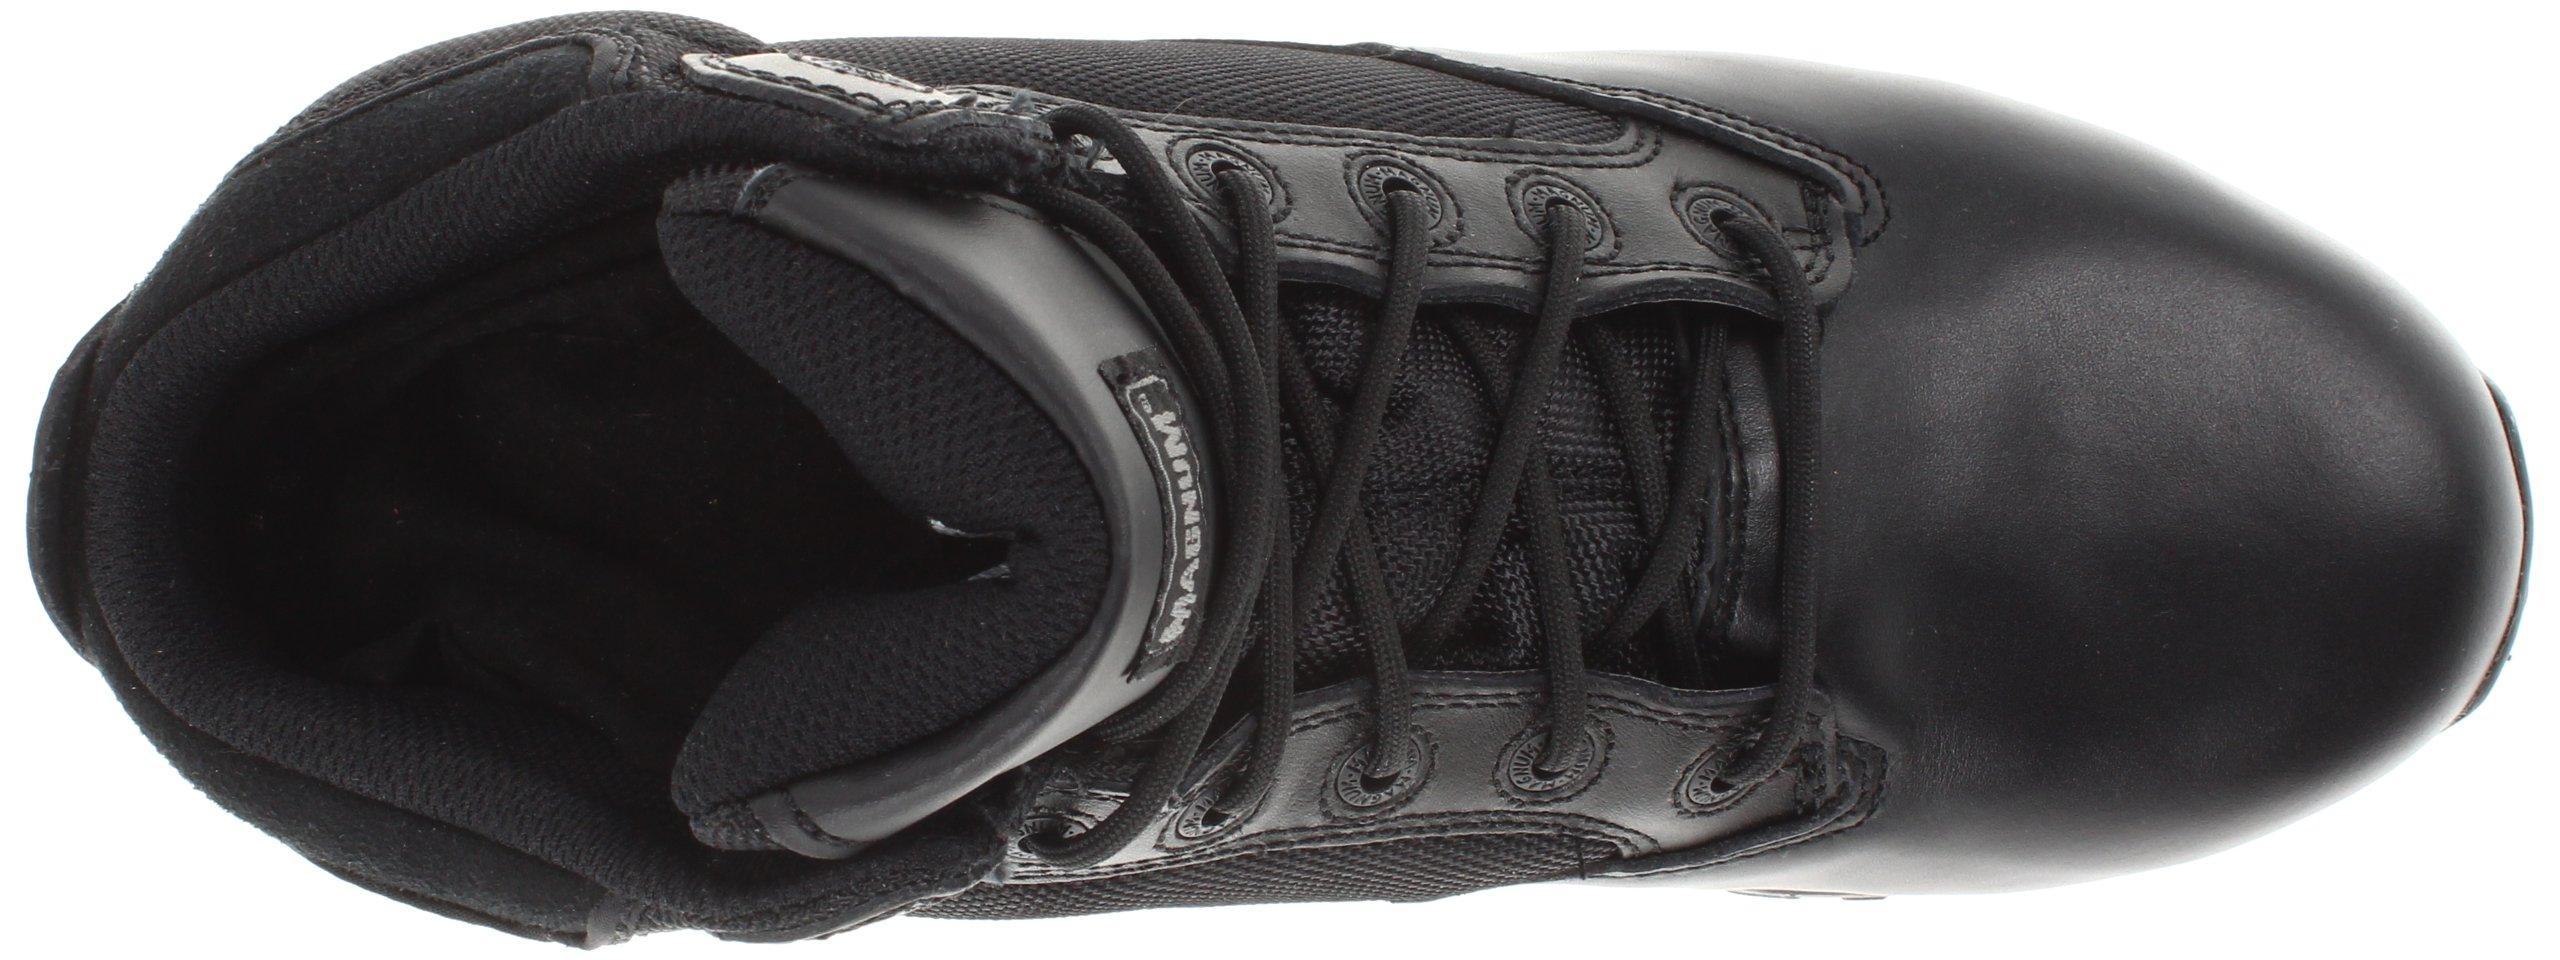 Magnum Men's Viper Pro 5 Waterproof Tactical Boot,Black,13 M US by Magnum (Image #7)